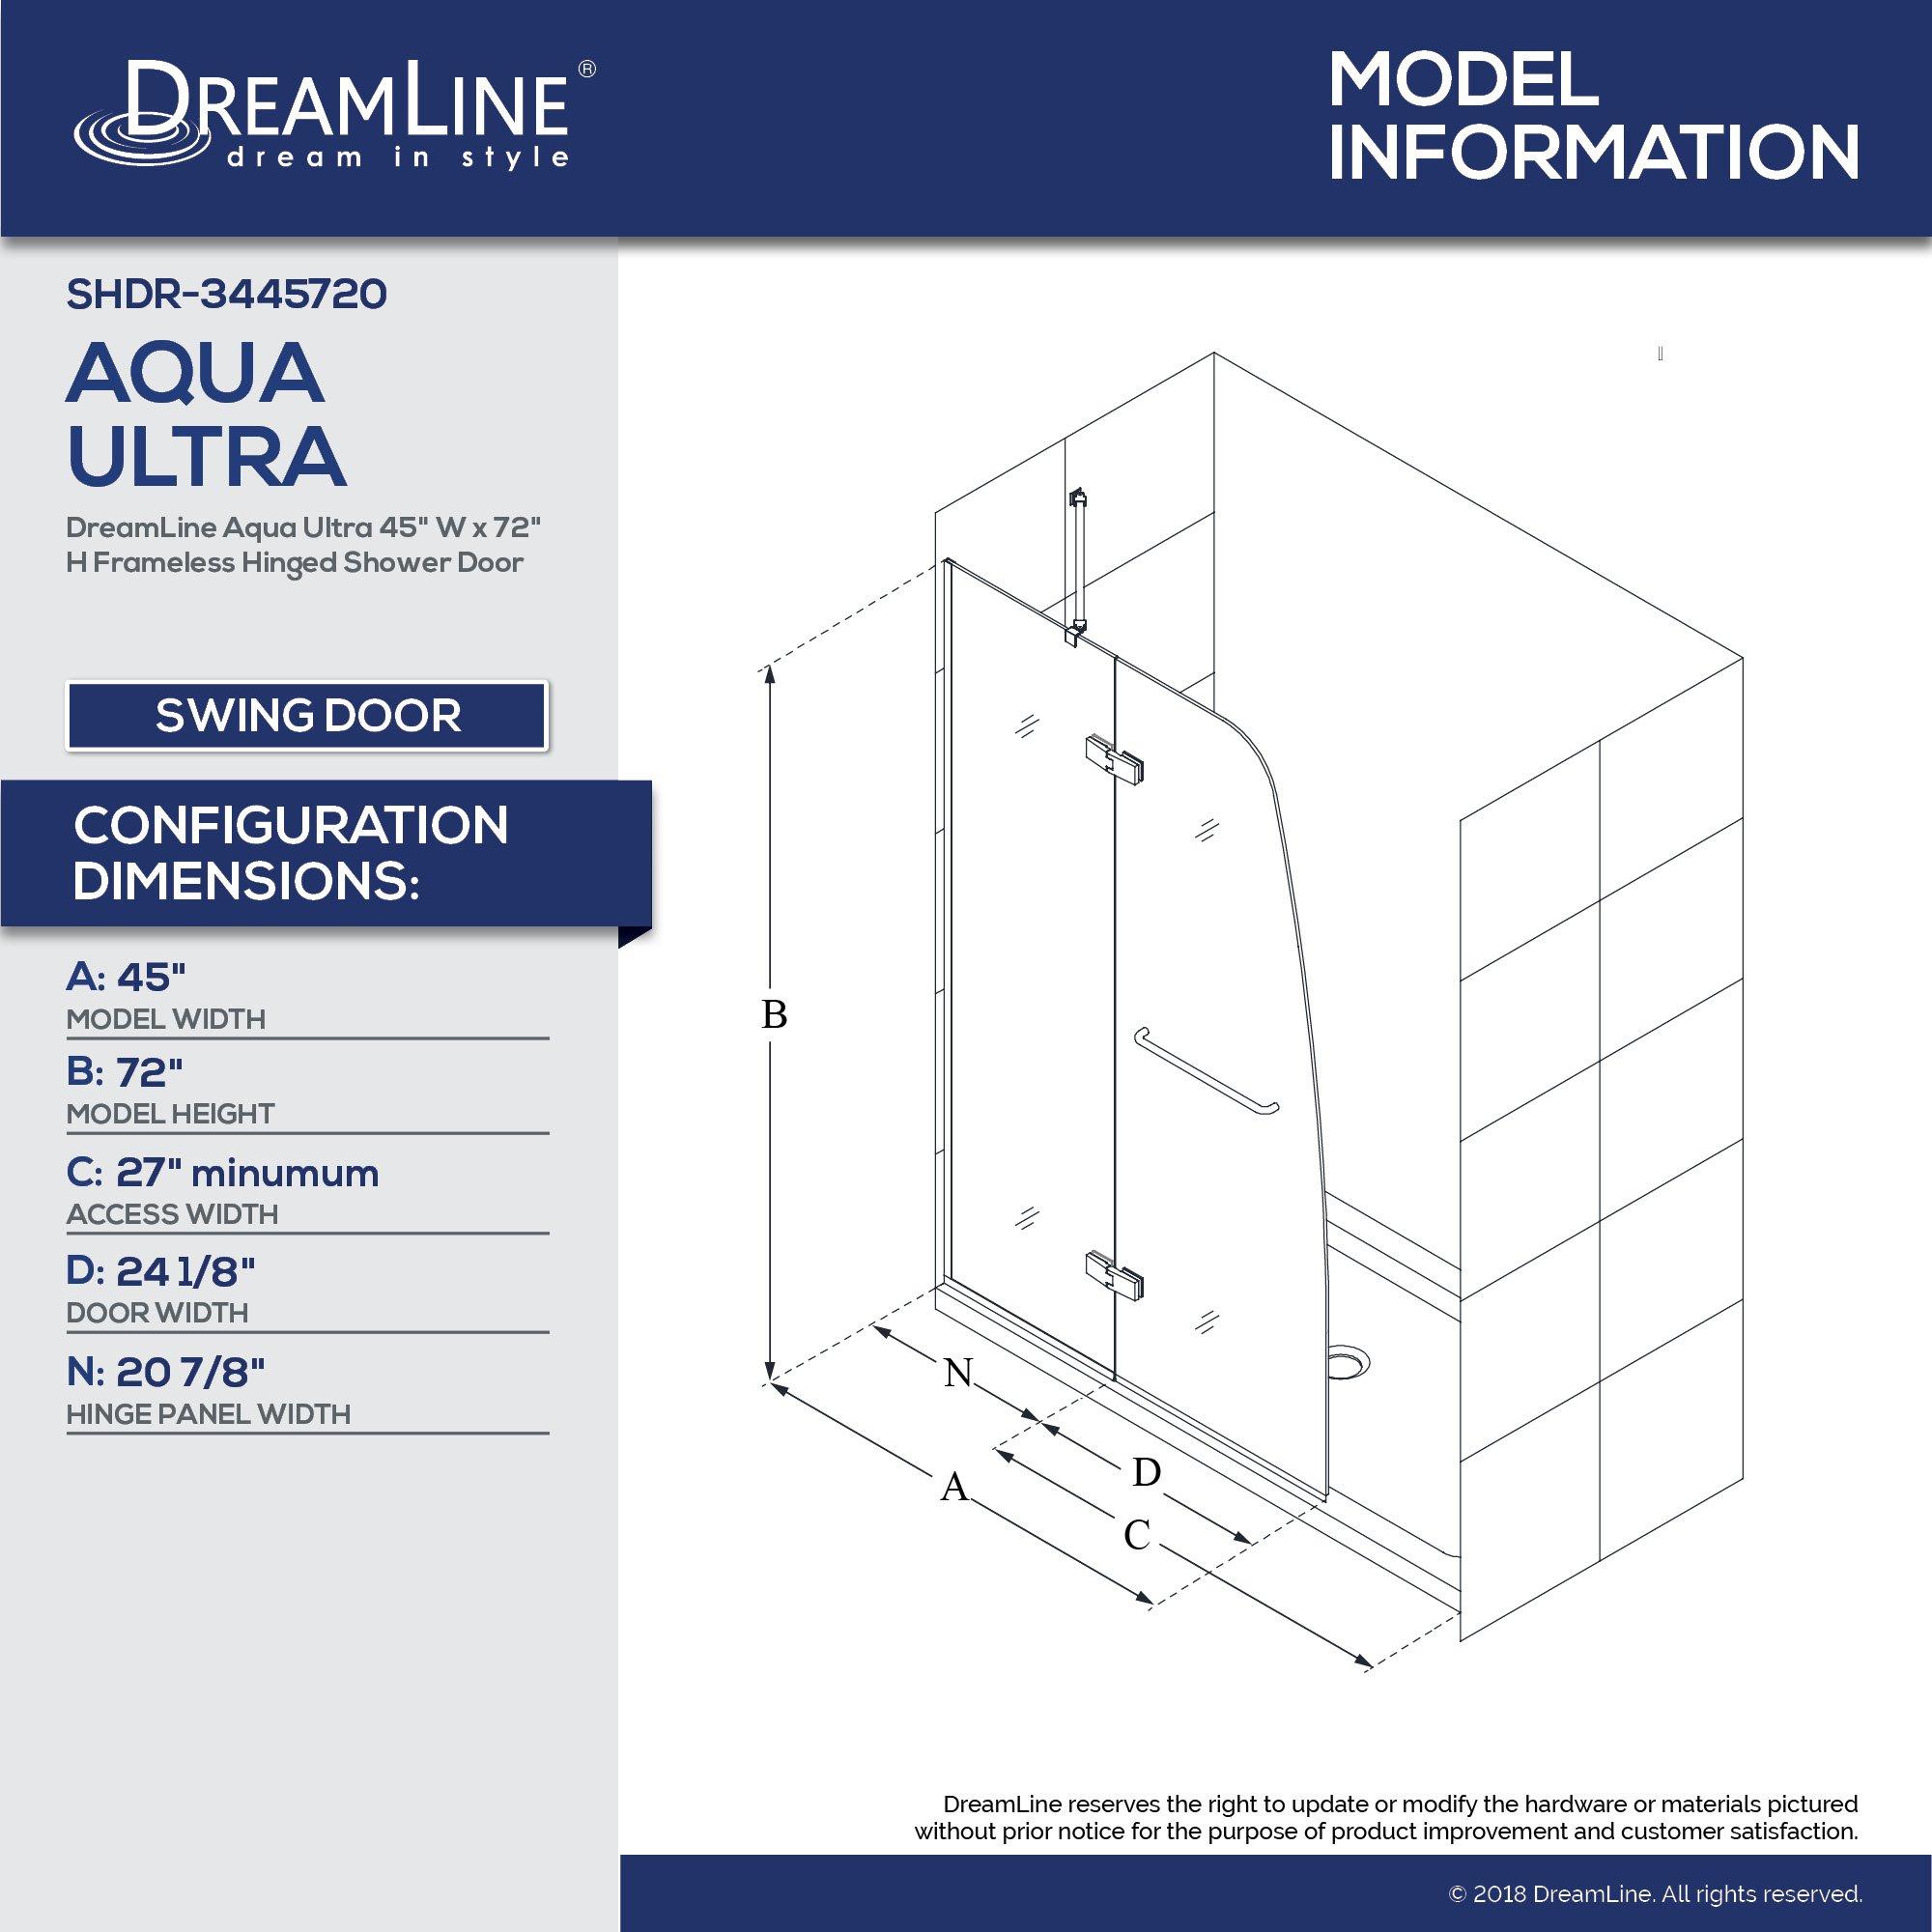 DreamLine Aqua Ultra 45 in. W x 72 in. H Frameless Hinged Shower Door in Brushed Nickel, SHDR-3445720-04 by DreamLine (Image #5)